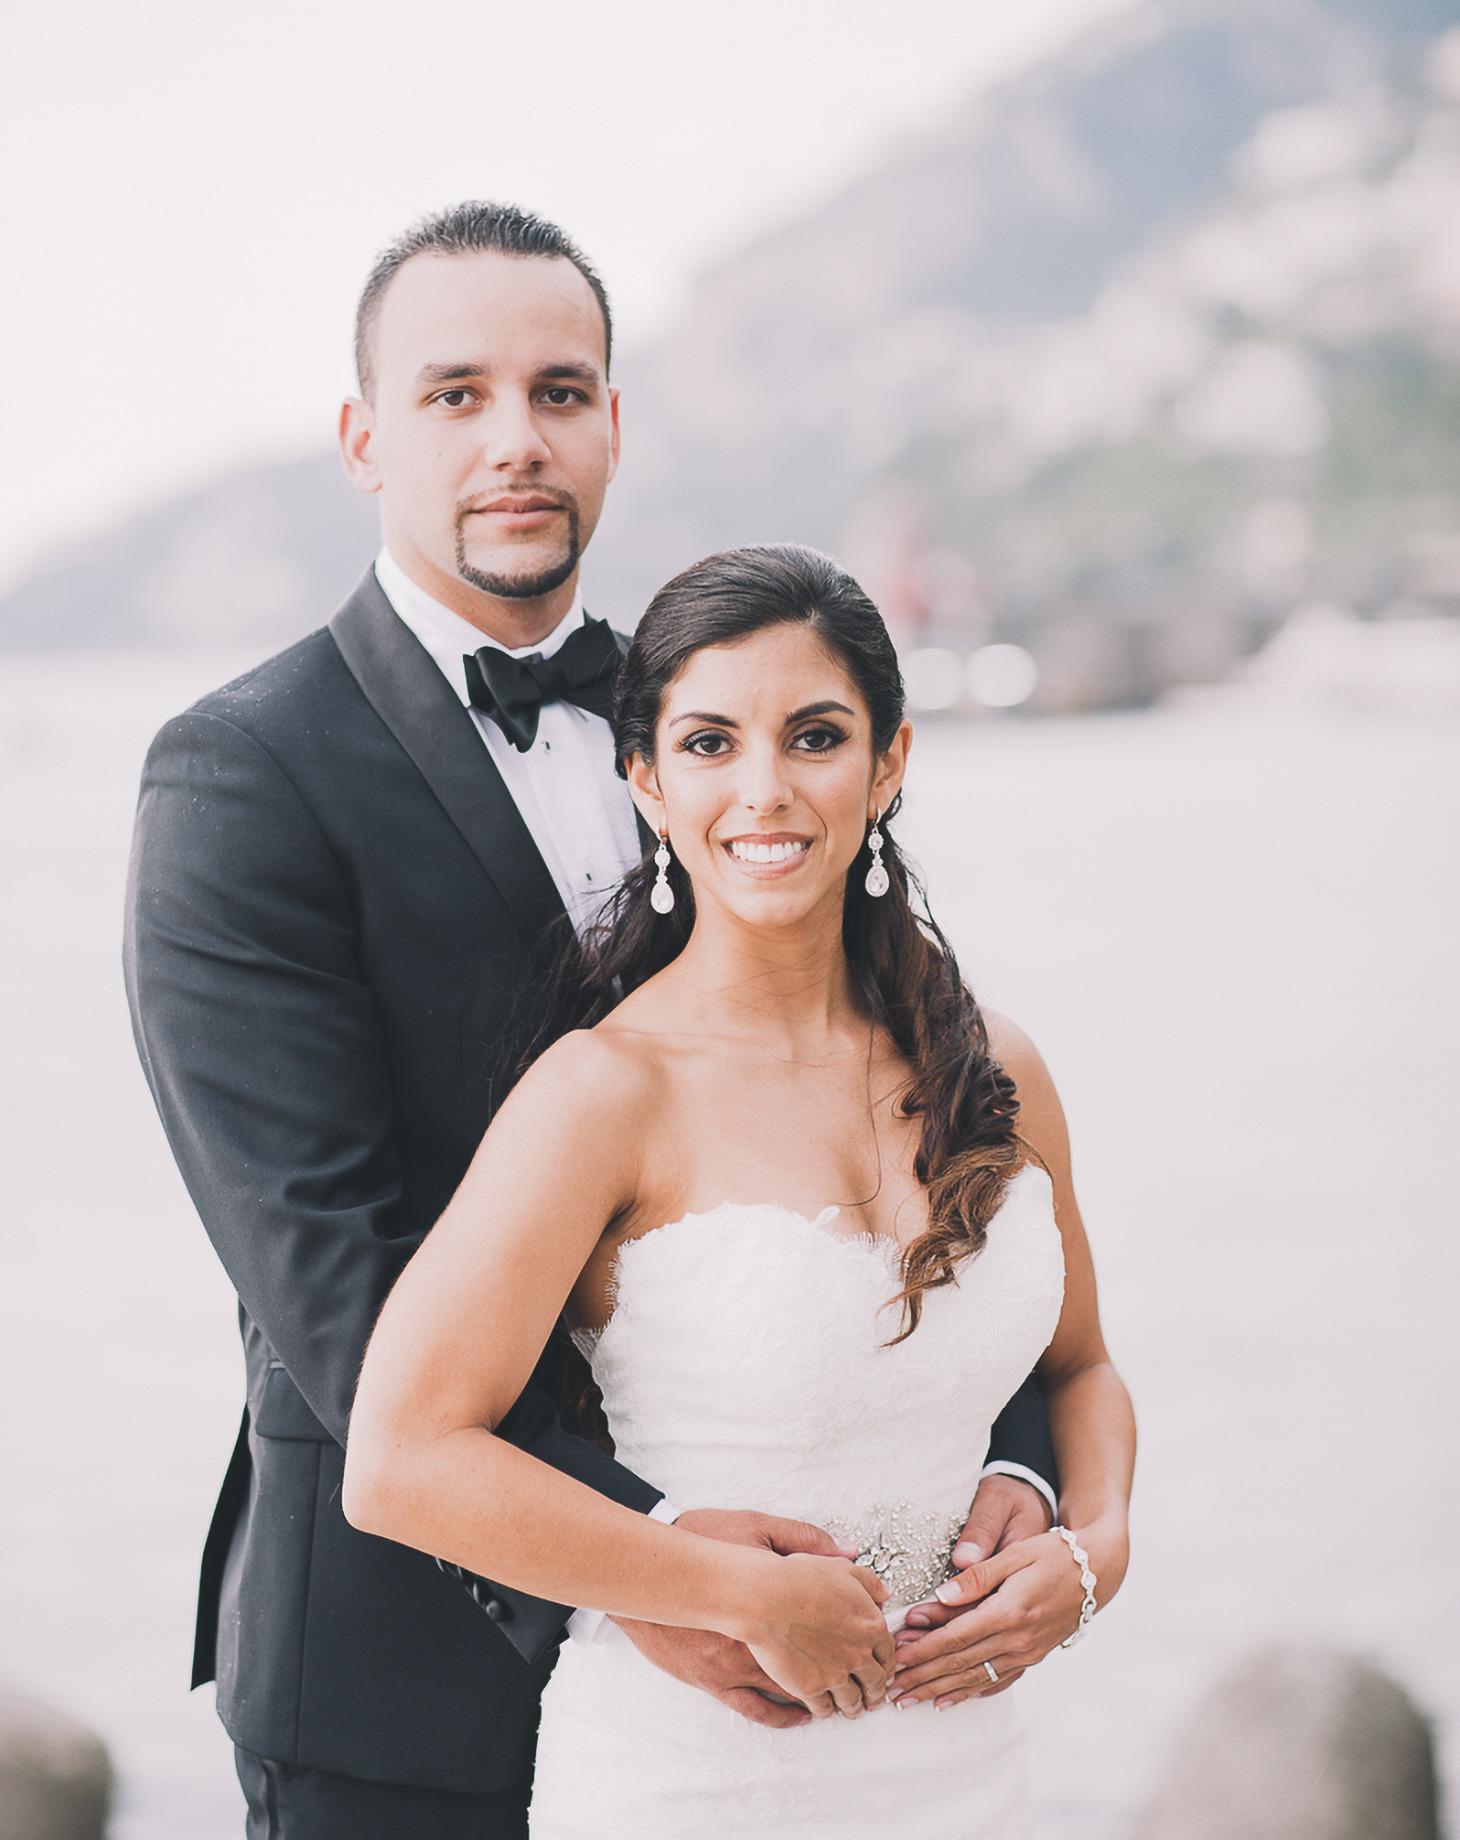 Alayn & Priscilla | Ravello